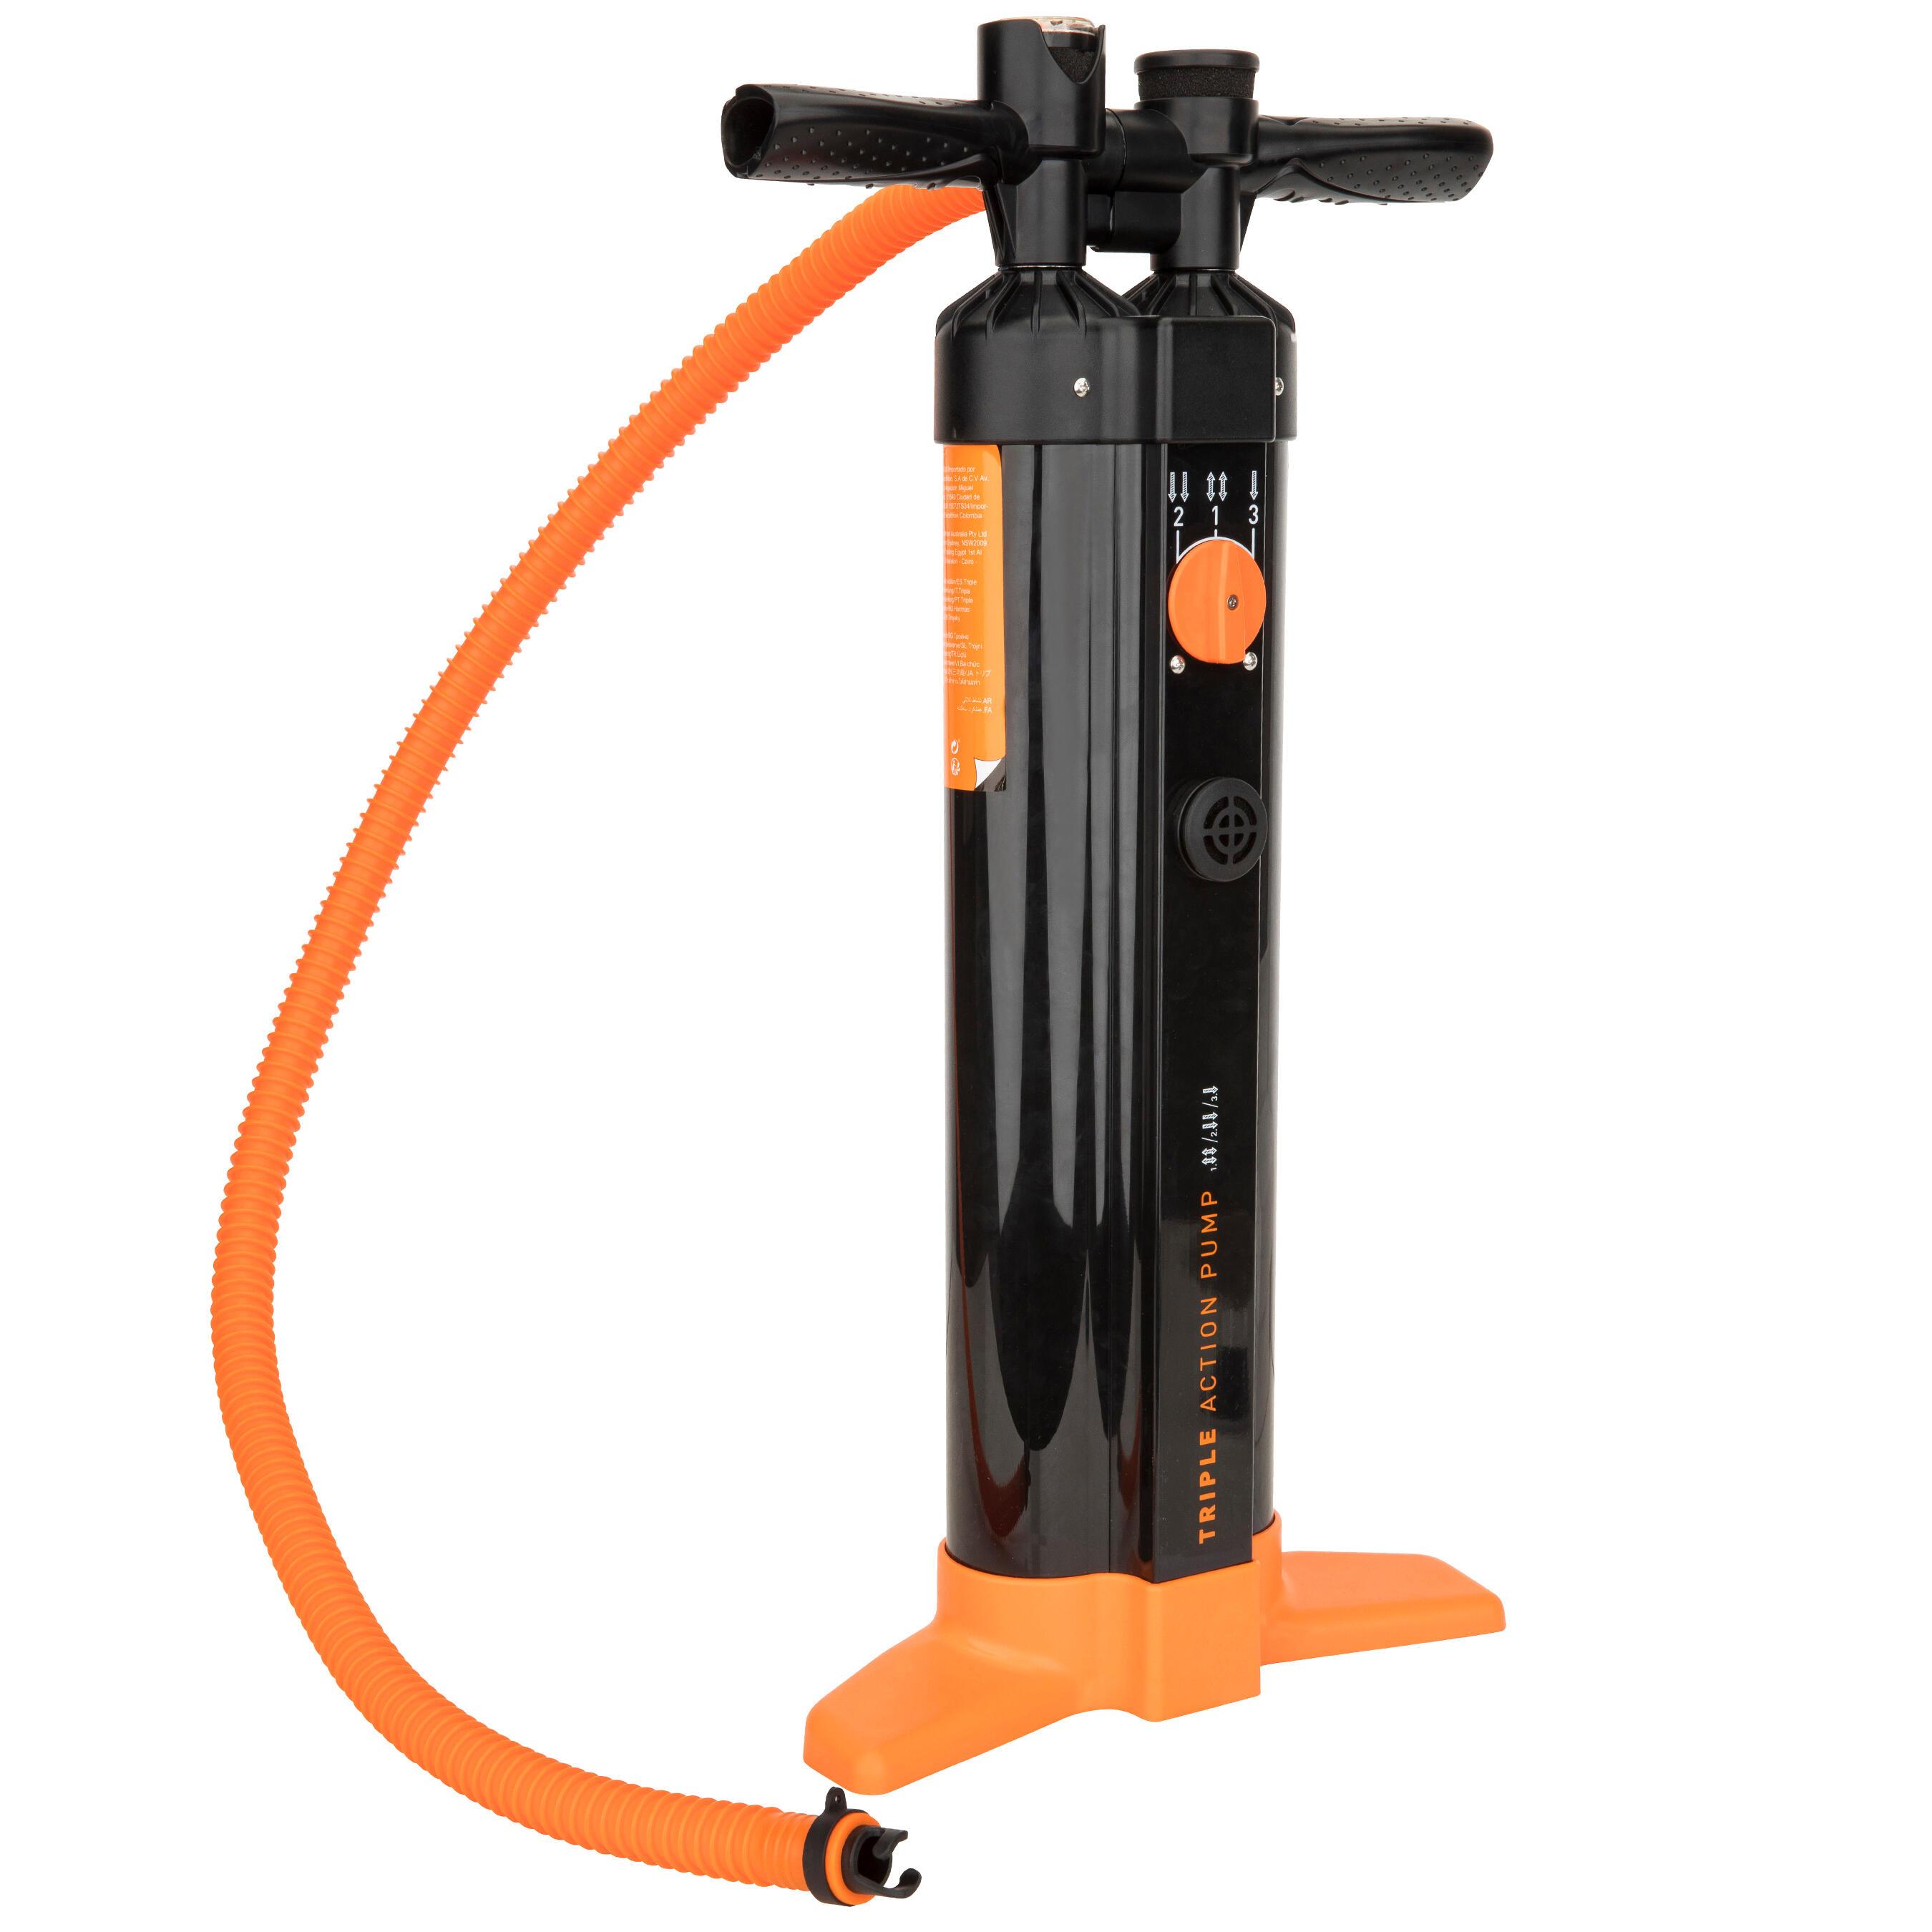 Itiwit SUP Board Handpumpe 20 PSI 3-stufig schwarz/orange